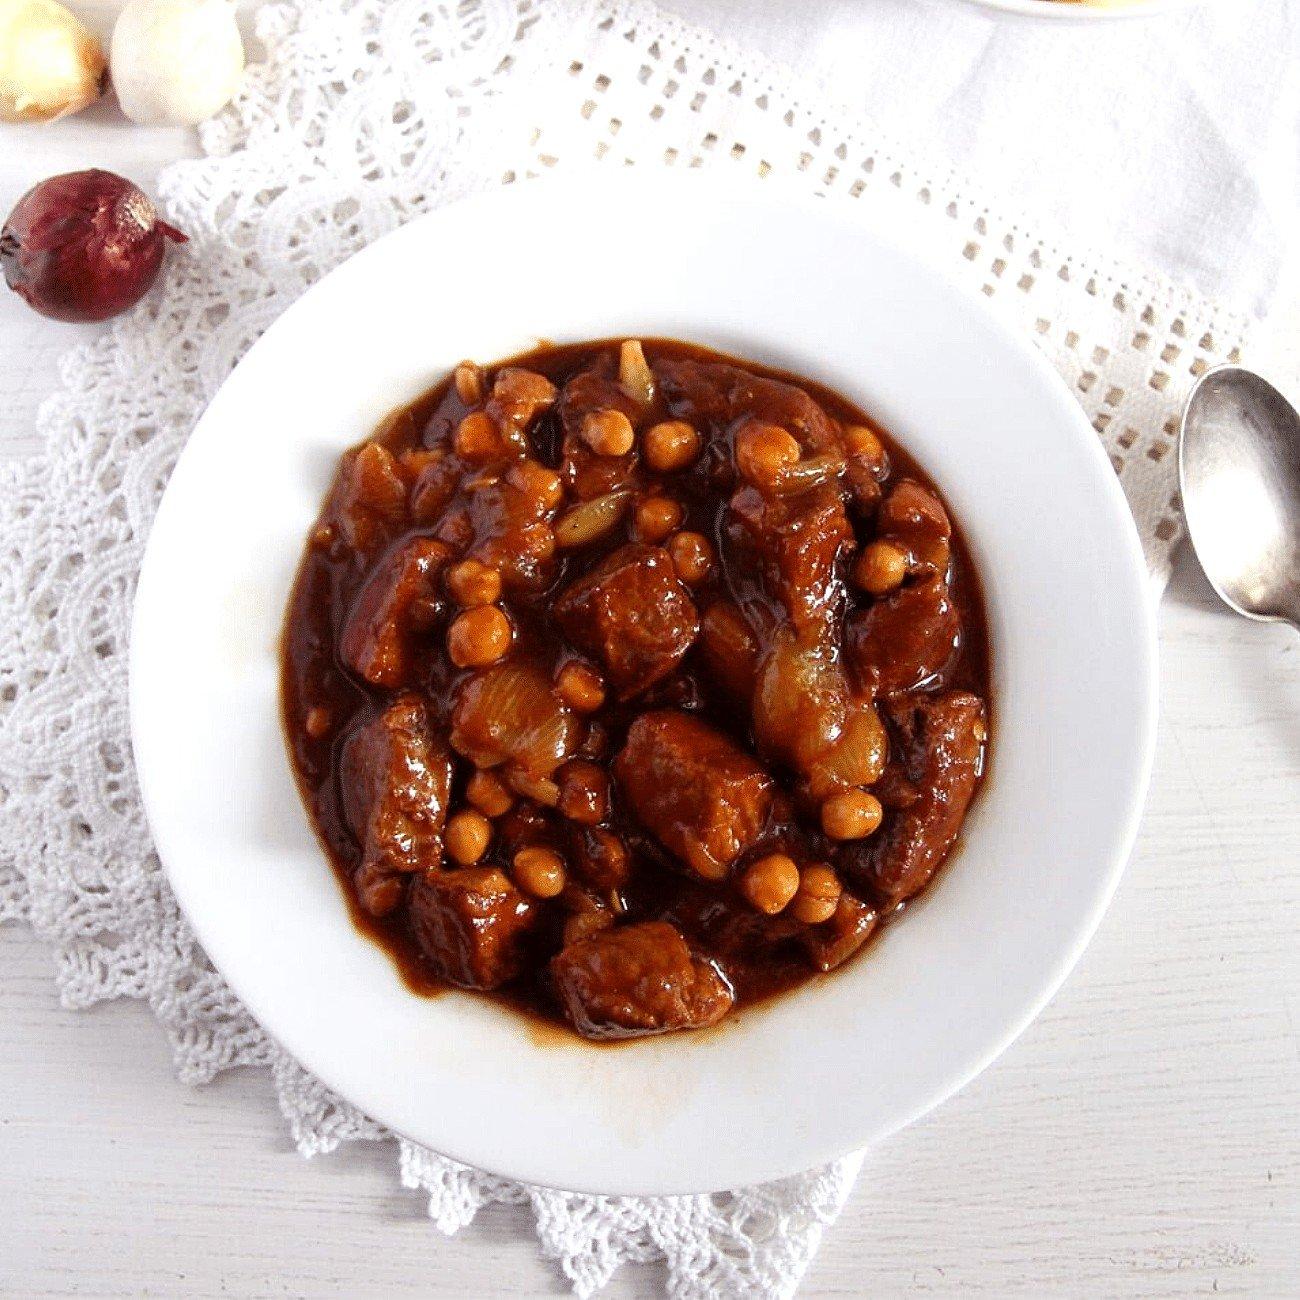 Spanish Pork Stew (with Chickpeas)